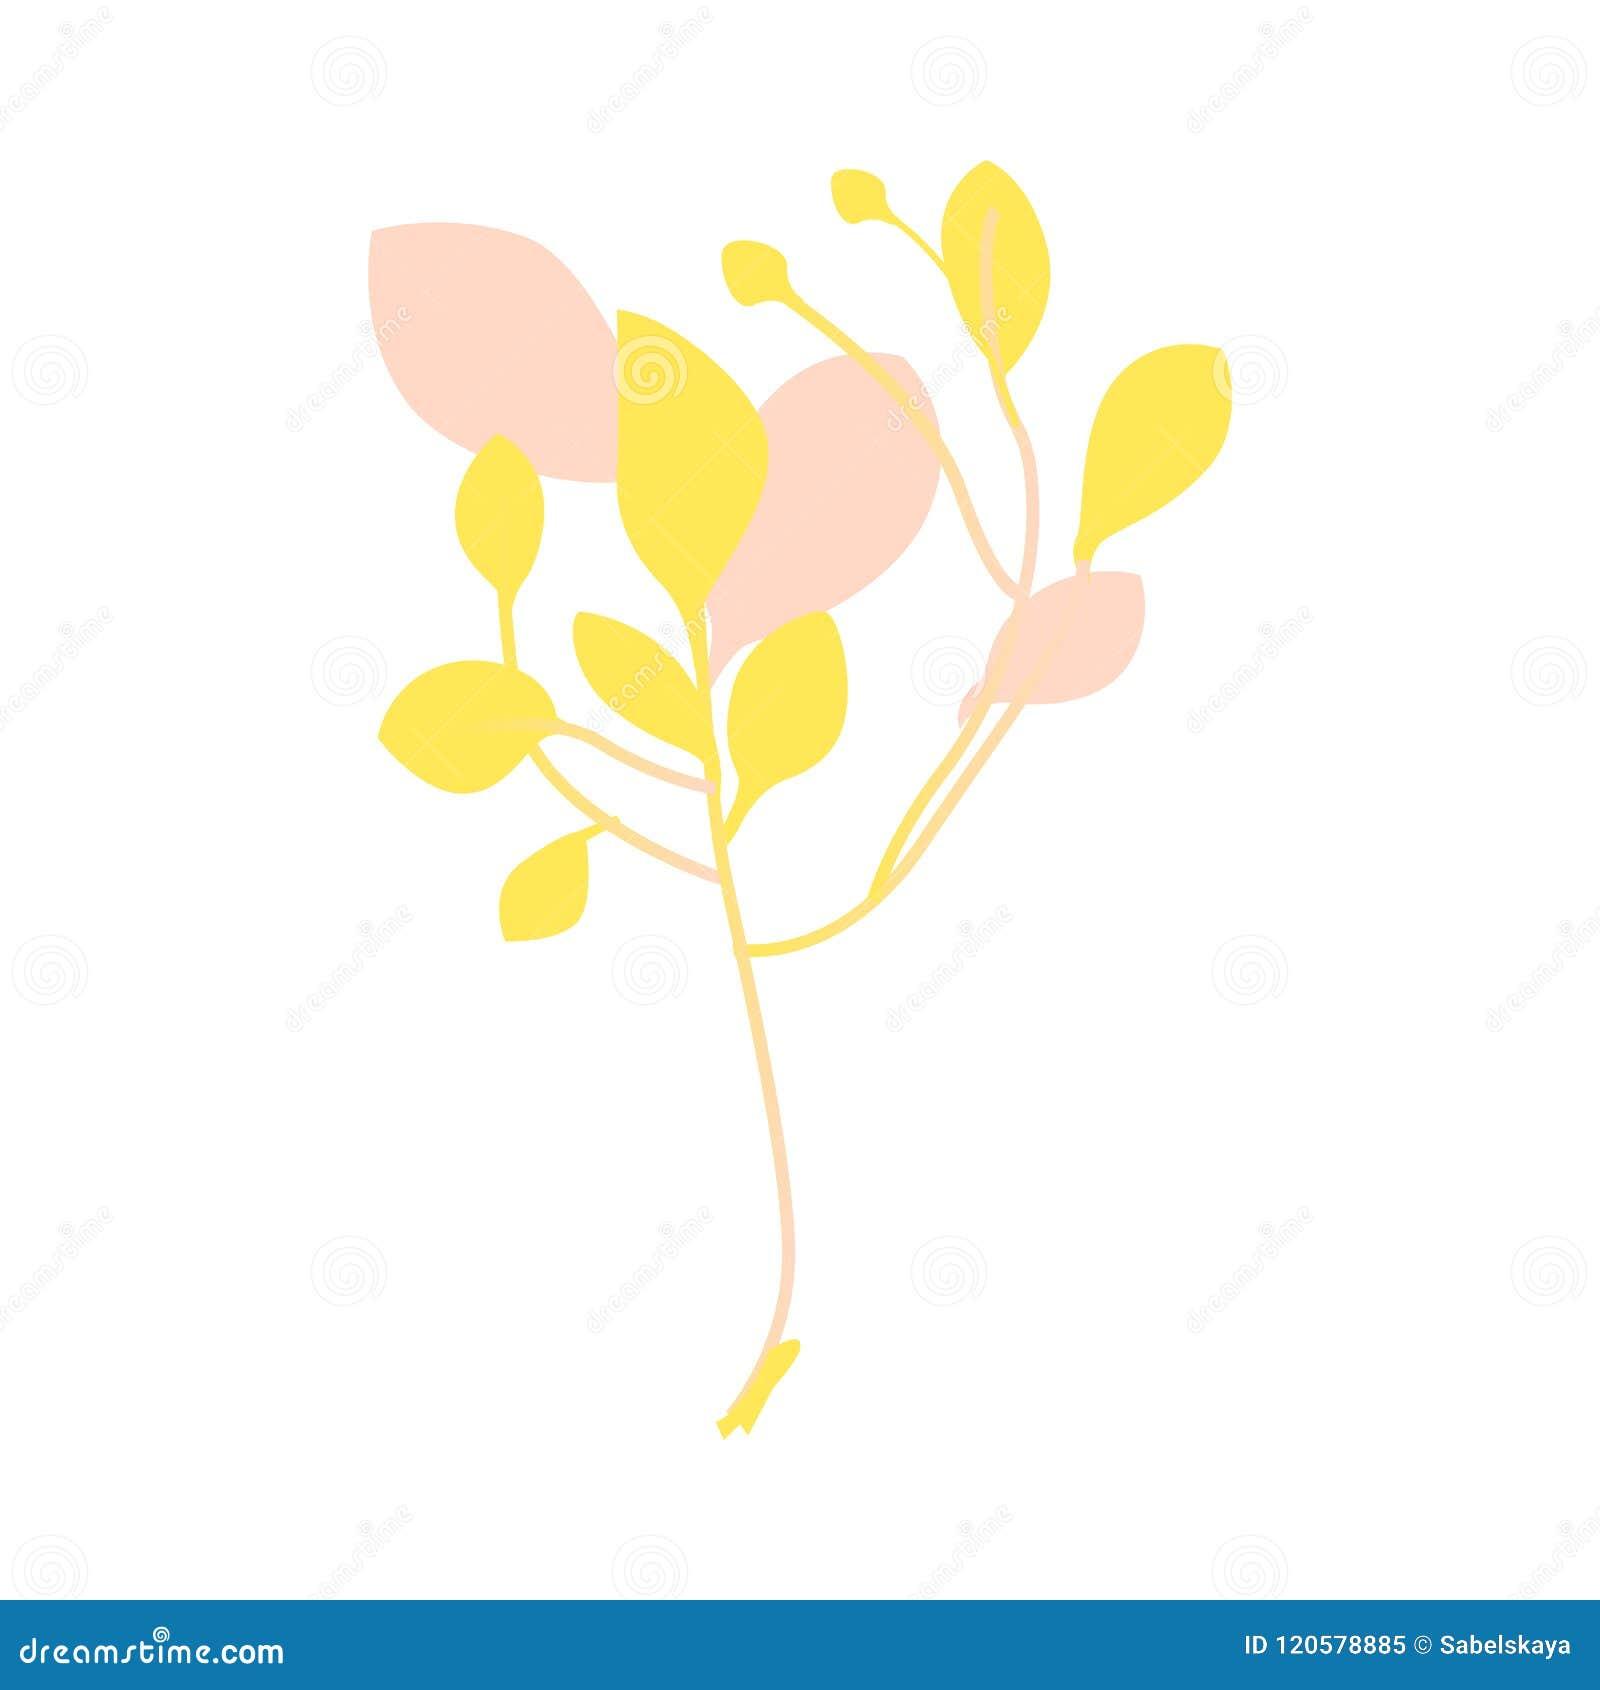 Vector Flat Abstract Autumn Plant Icon Stock Vector Illustration